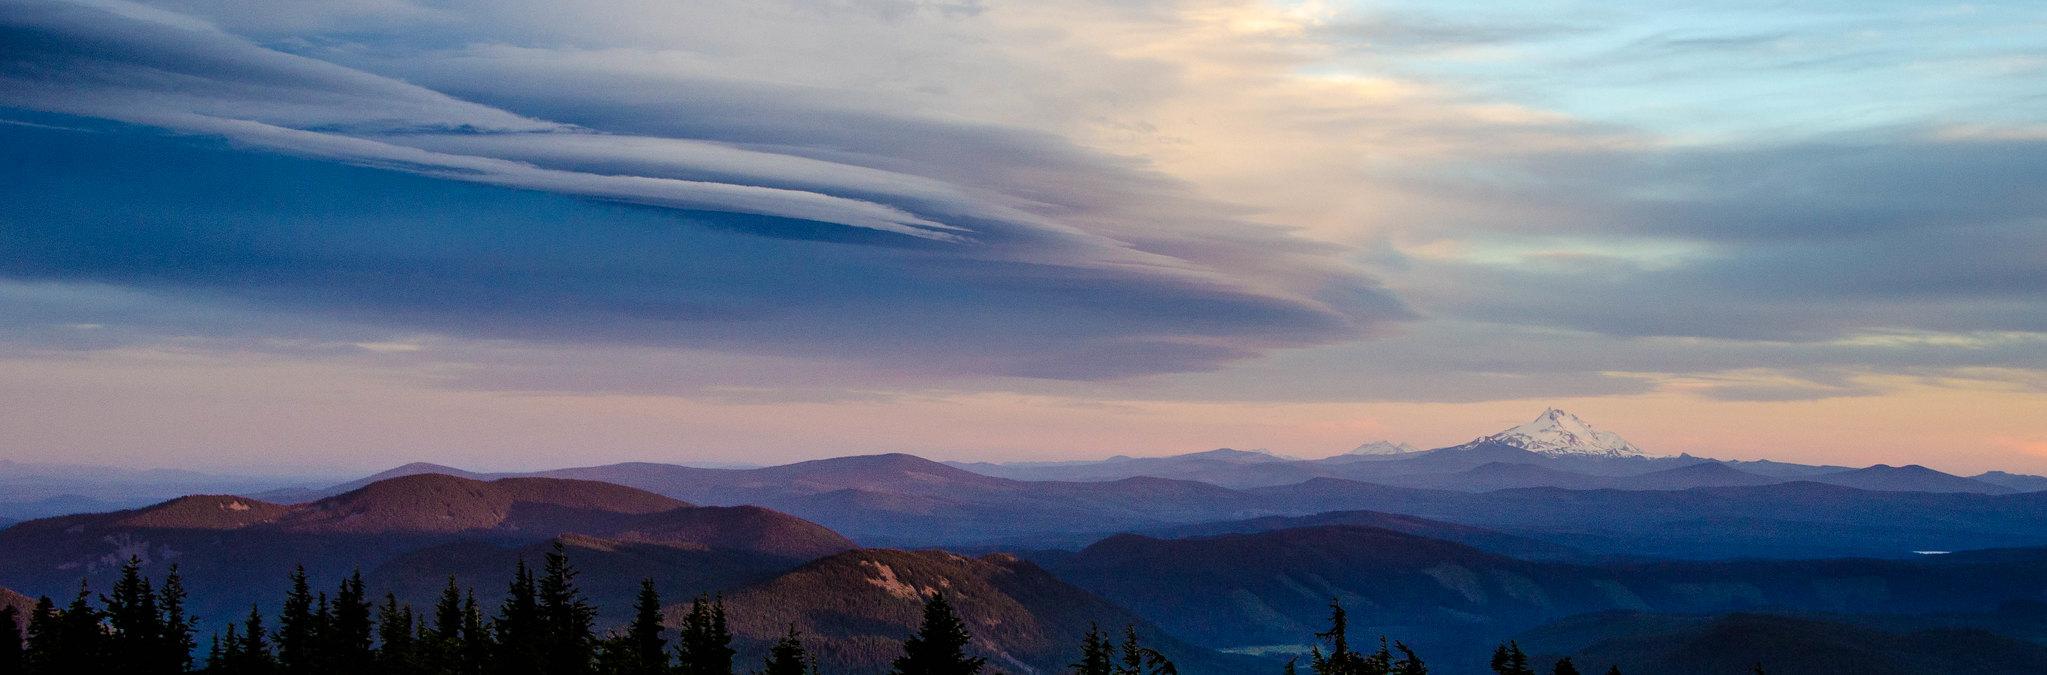 Sunset at Timberline Lodge Panoramic